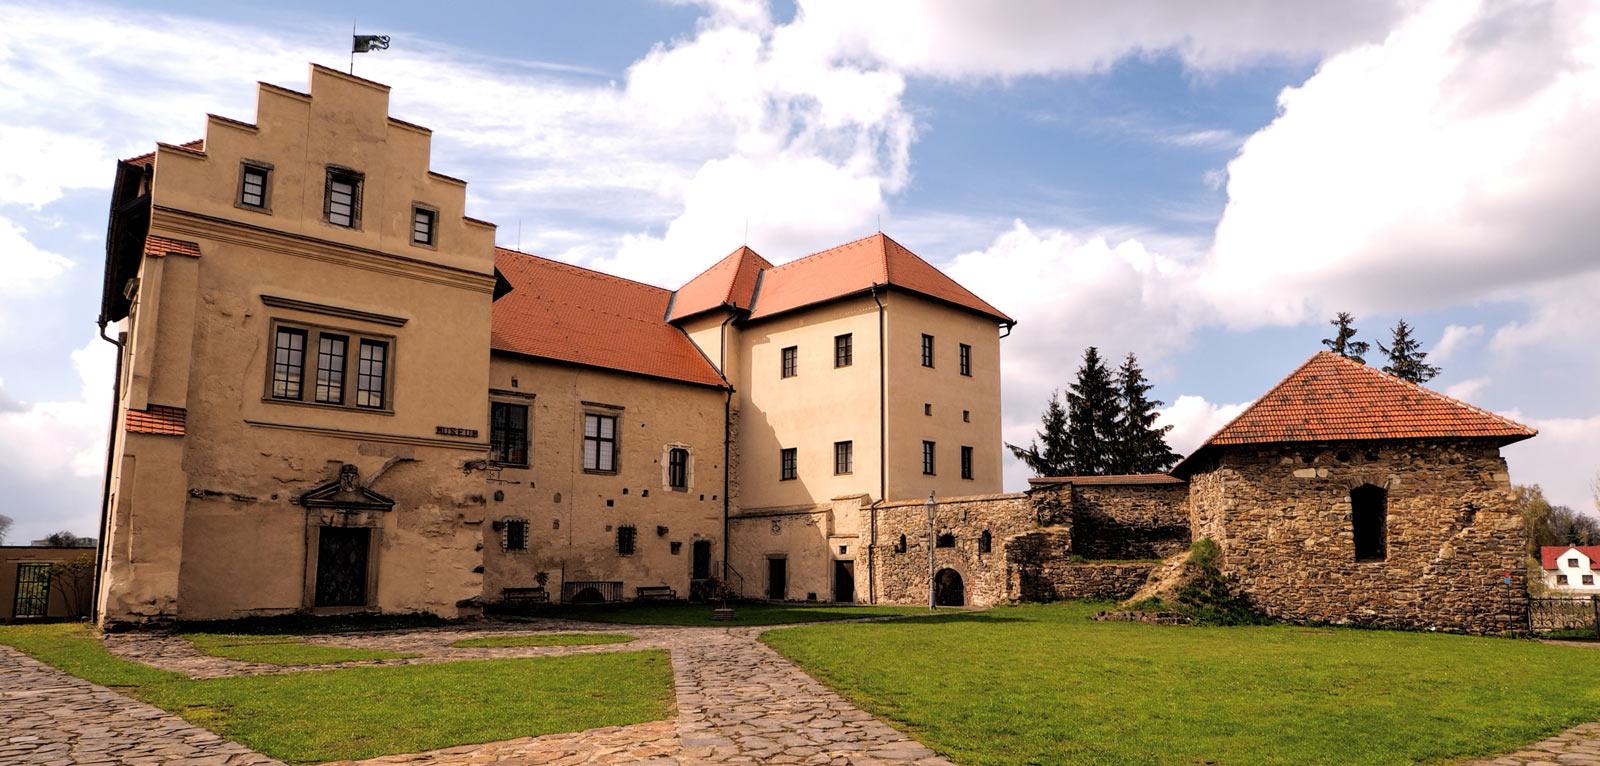 Mestske-muzeum-Polna-1600x766-01.jpg